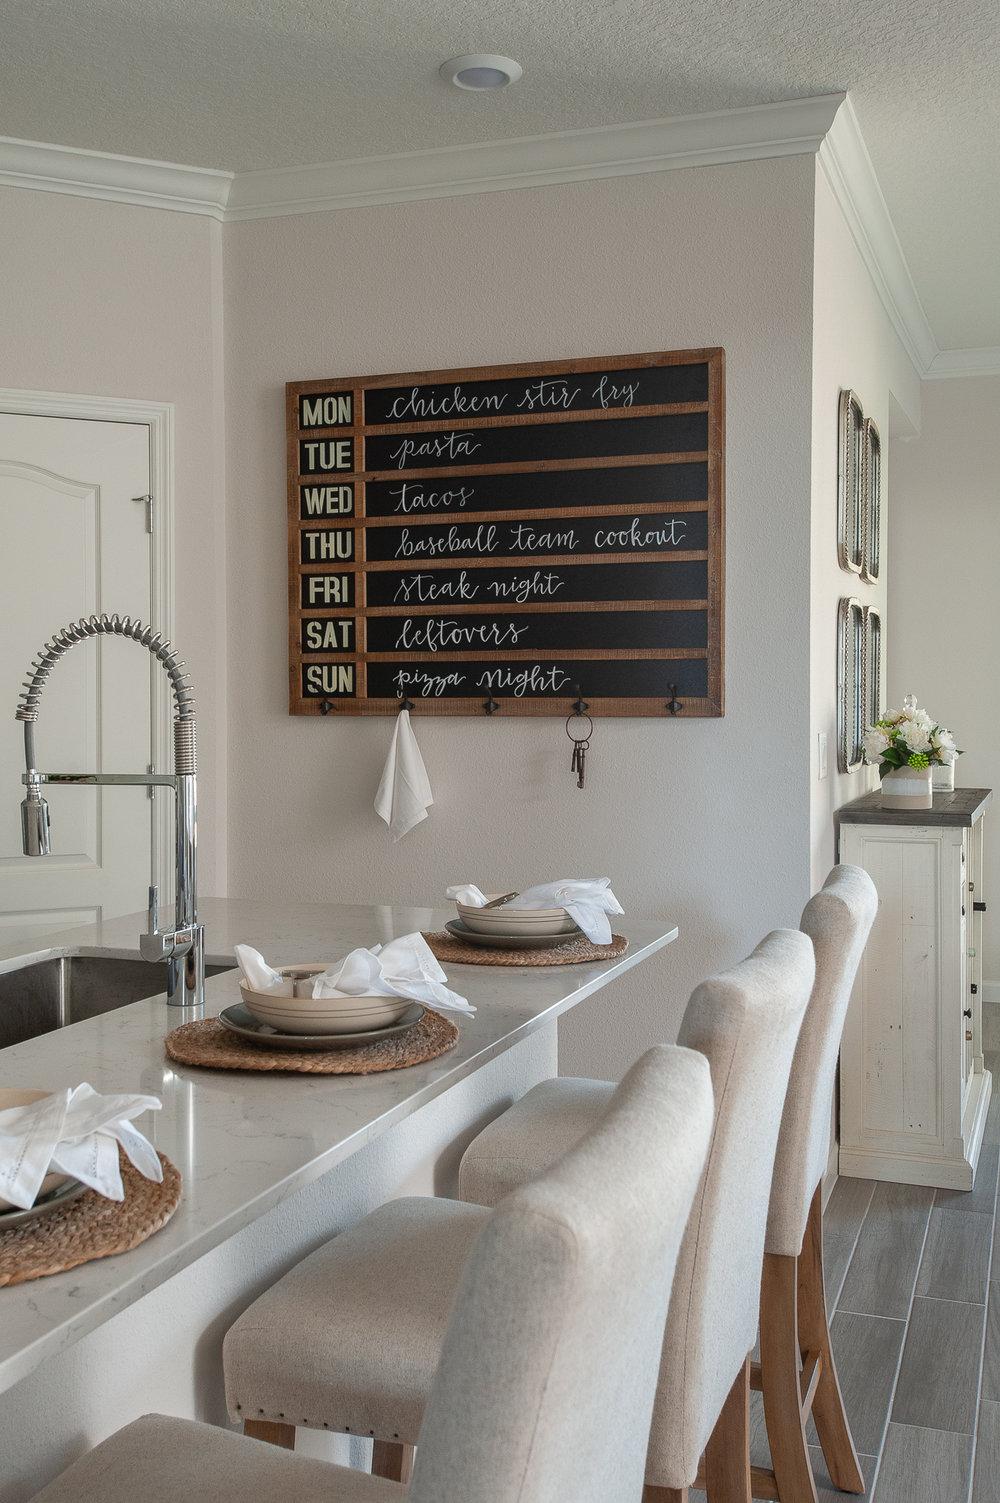 Micamy_Interior Designer_Design_Interior_Model_Merchandising_Kitchen_Grey_Cabinets_Forty West_Lennar_Place Setting_ChalkboardMenu_Faucet.jpg